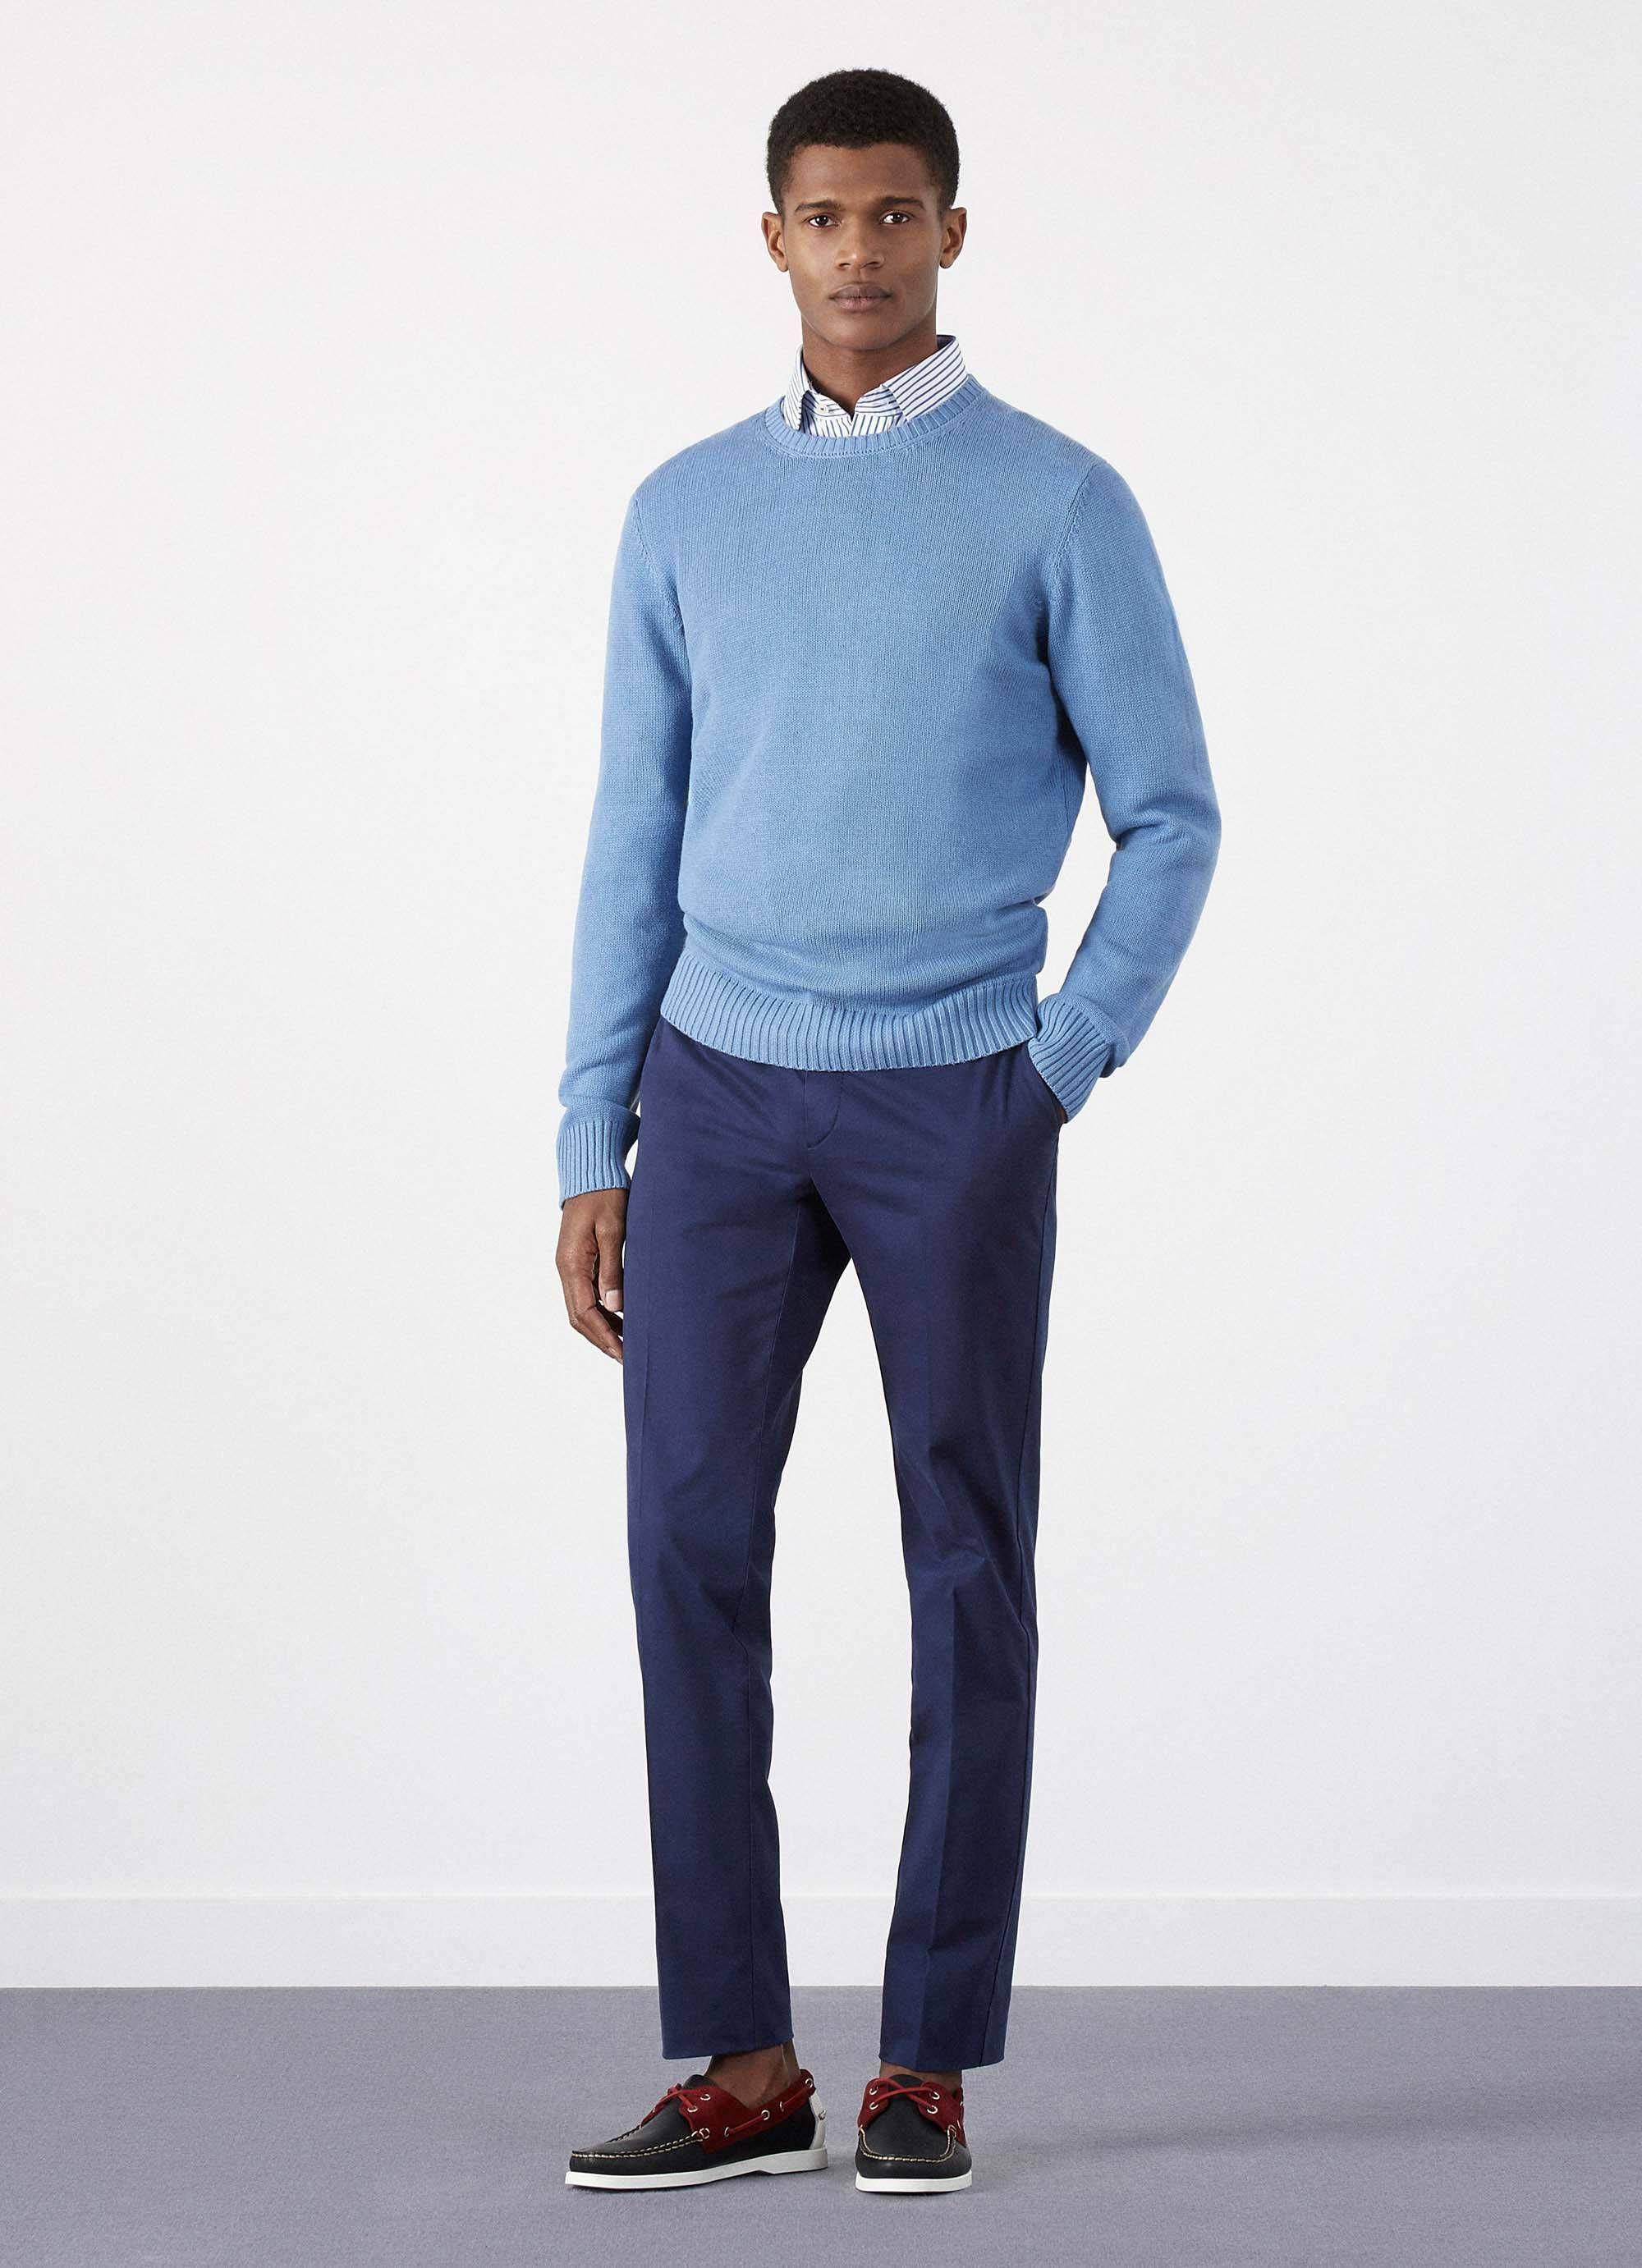 Wool and Cotton Crew Neck Jumper - Knitwear - Clothing - Men | Hackett